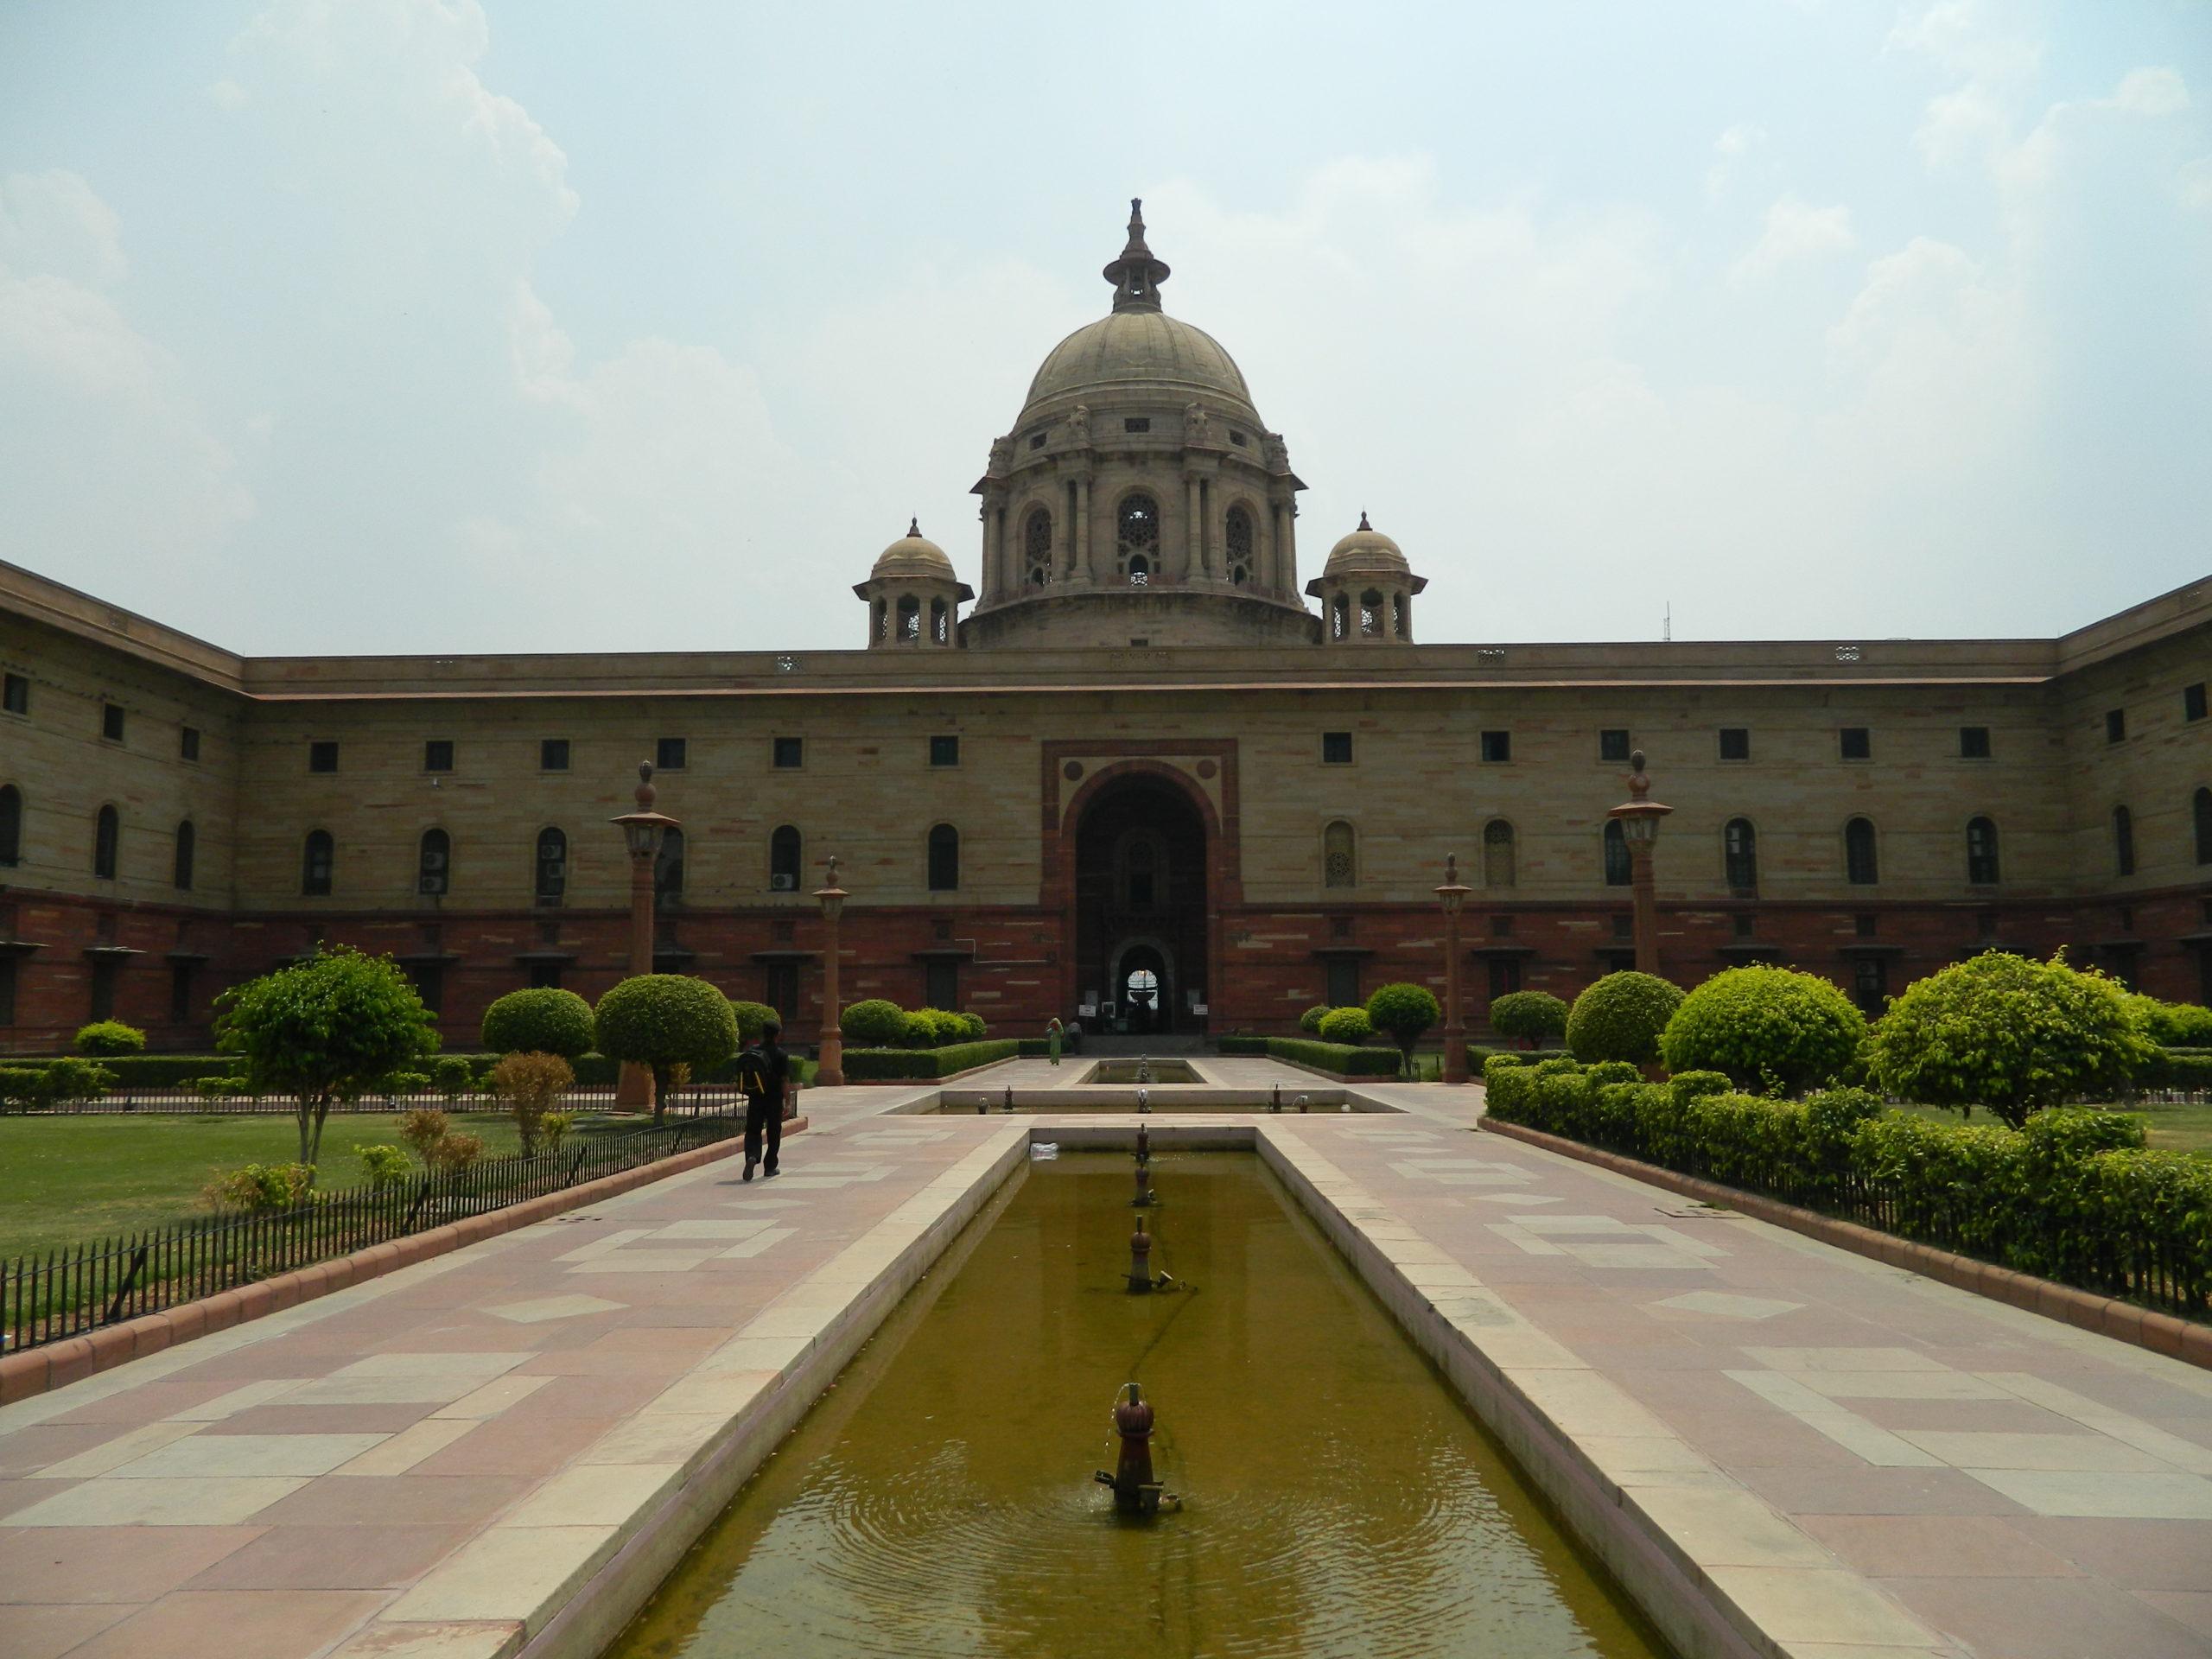 Trial Before Session Court in Hindi - सेशन न्यायालय के समक्ष विचारण